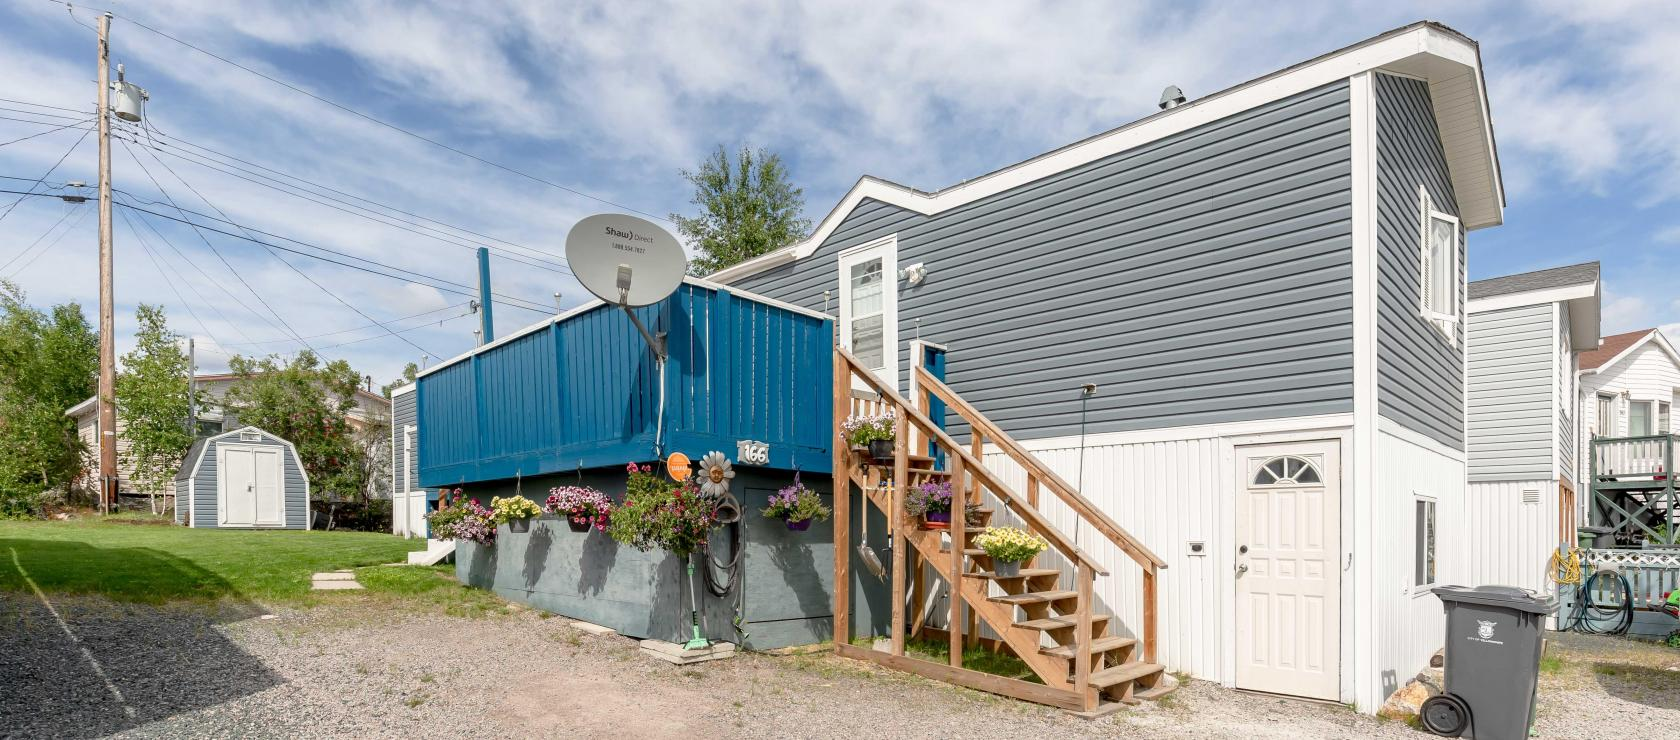 166 Wilkinson Crescent, Range Lake, Yellowknife 2